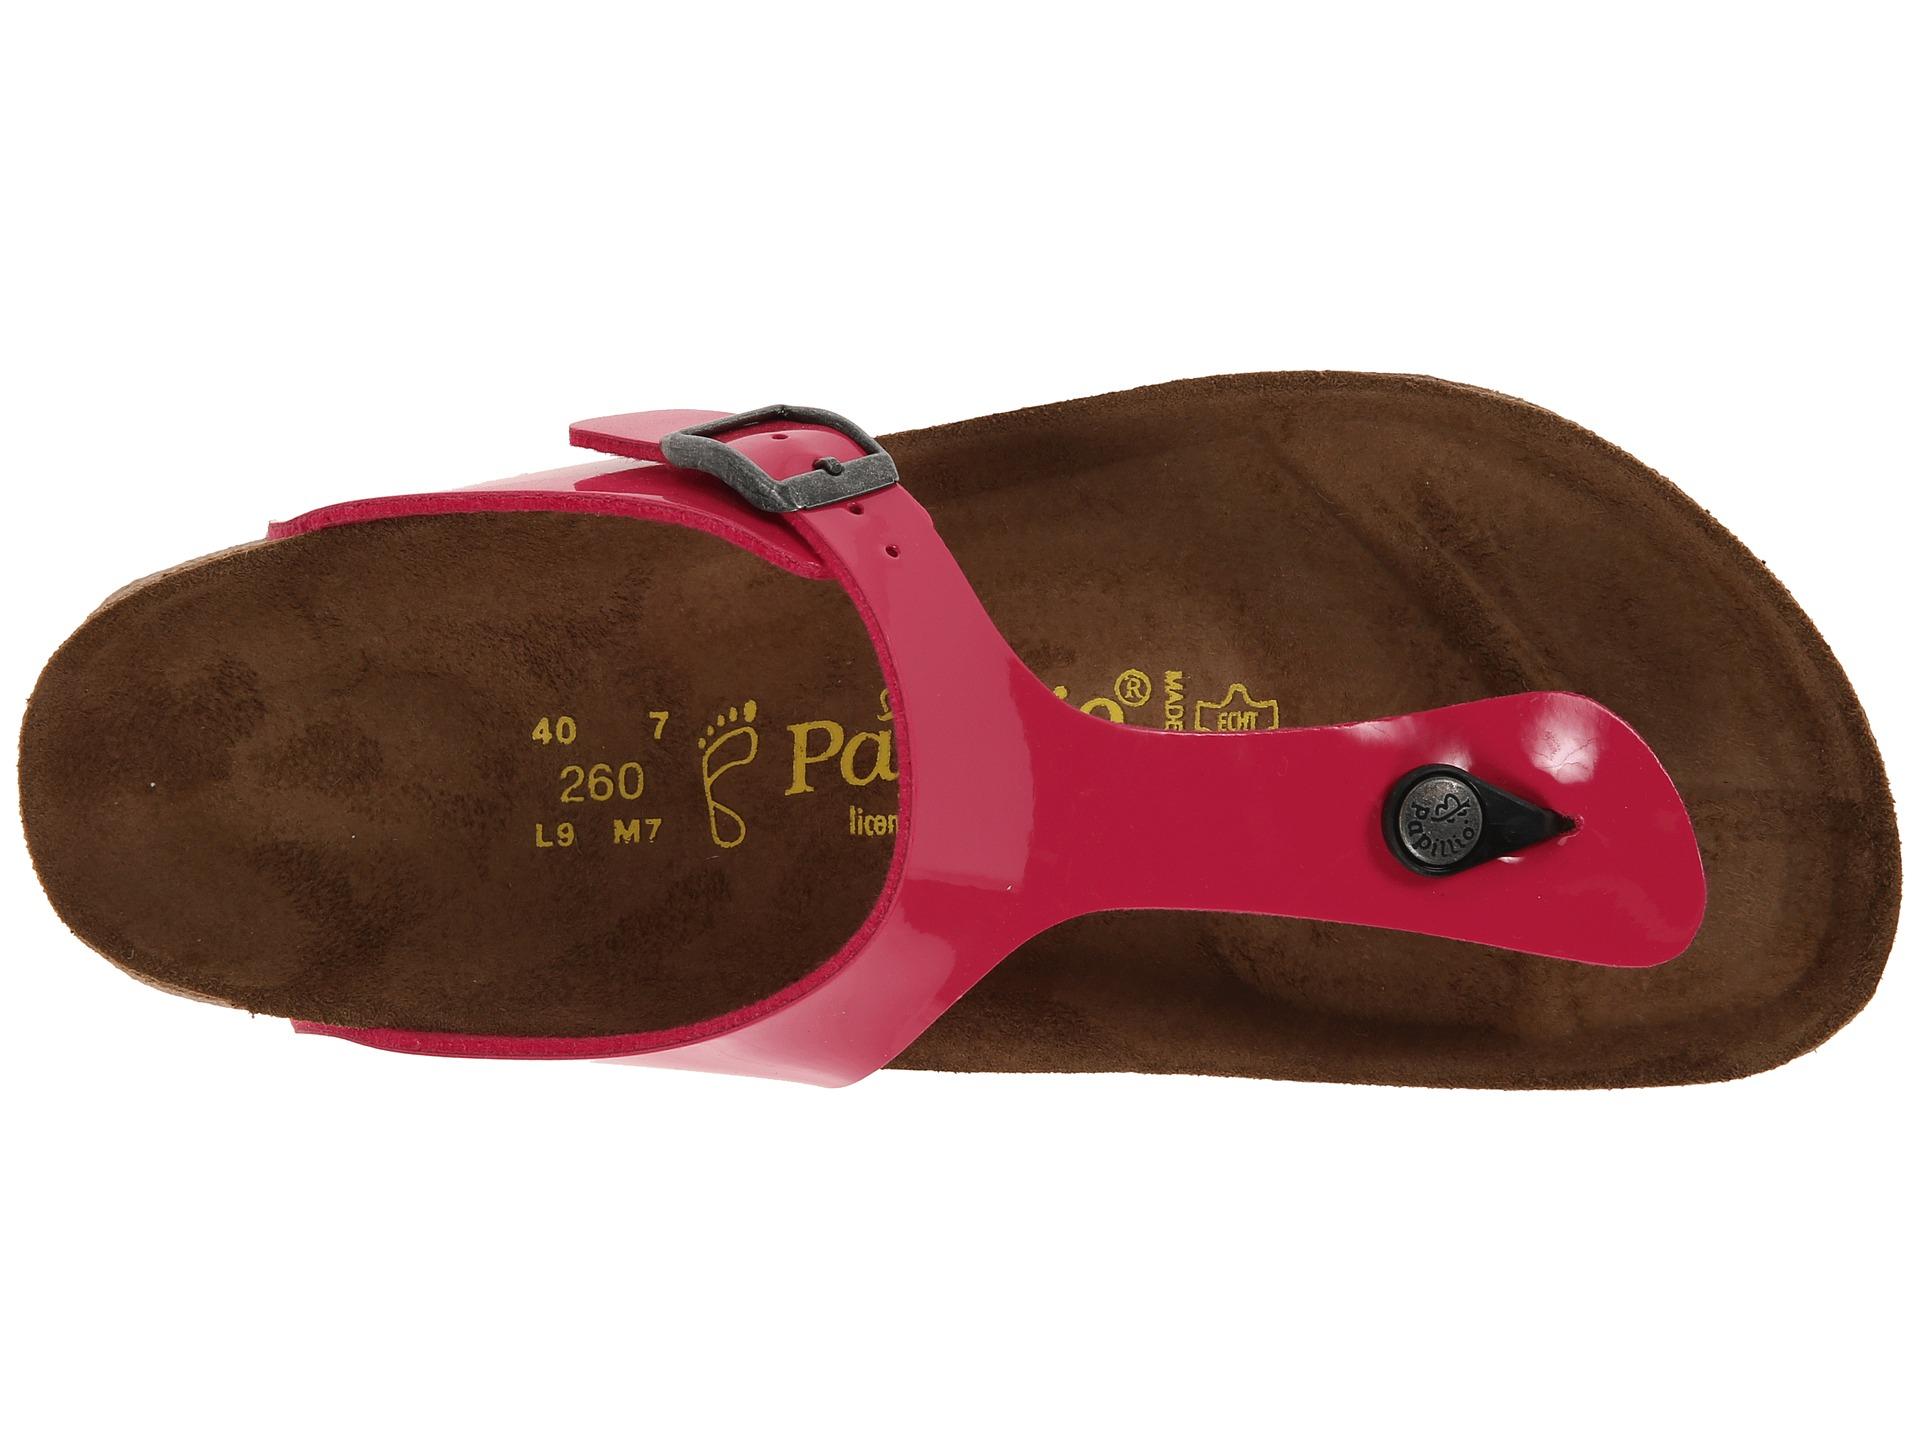 97ef34ba0db9 Lyst - Birkenstock Gizeh Platform By Papillio in Pink